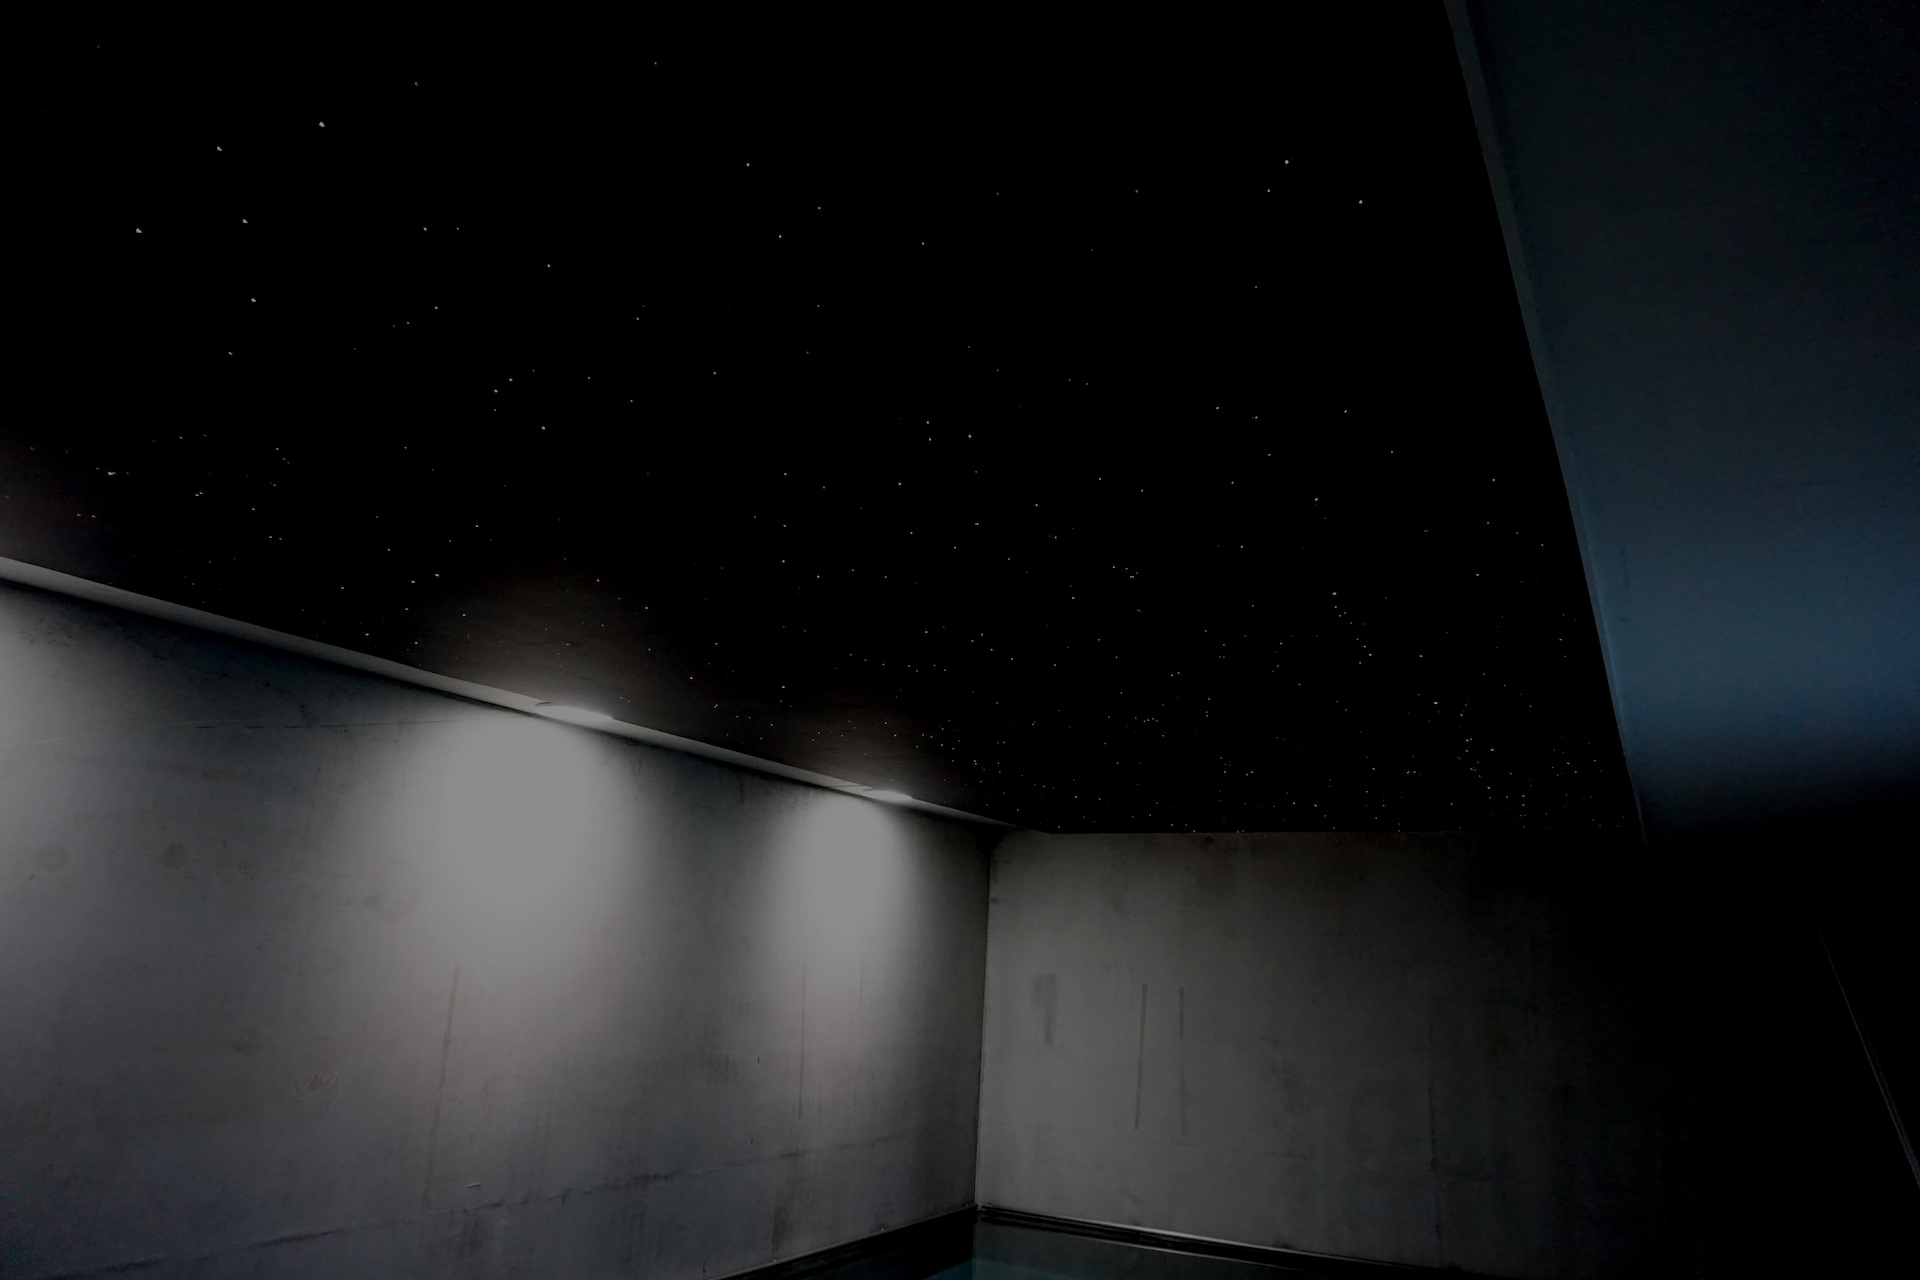 sterrenhemel plafond verlichting zwembad LED glasvezel MyCosmos techniek licht sterren wellness pool jacuzzi